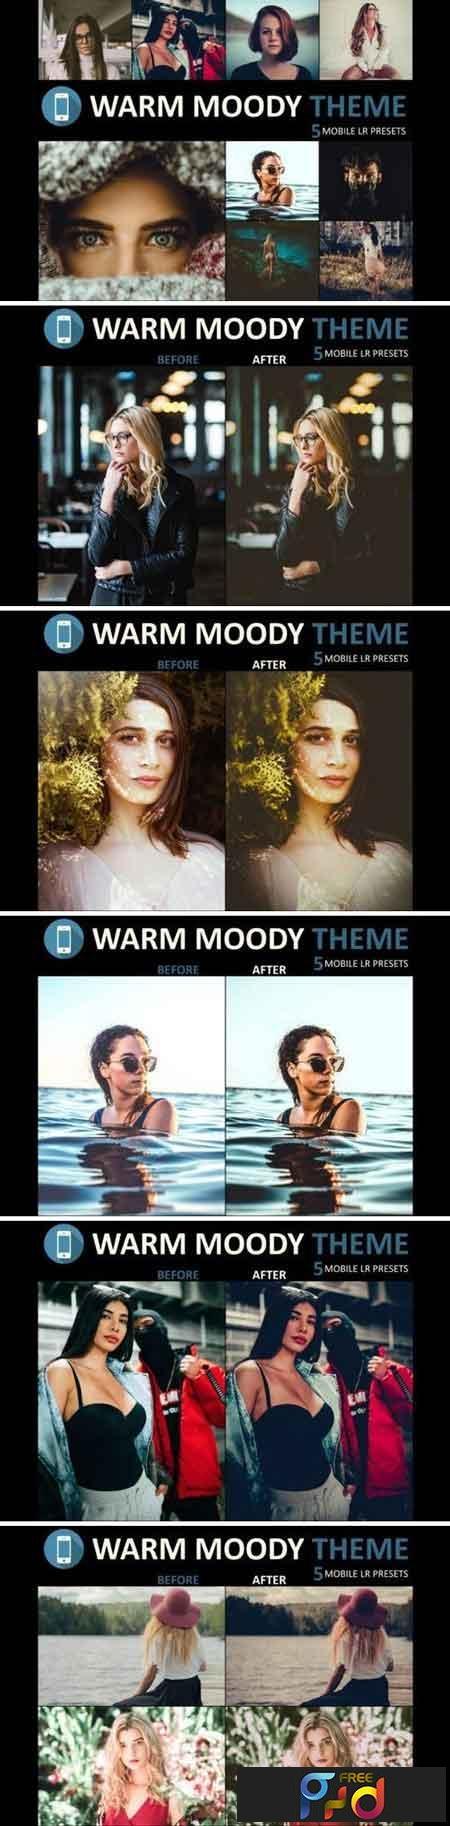 Neo Warm Moody mobile lightroom presets 193646 - FreePSDvn